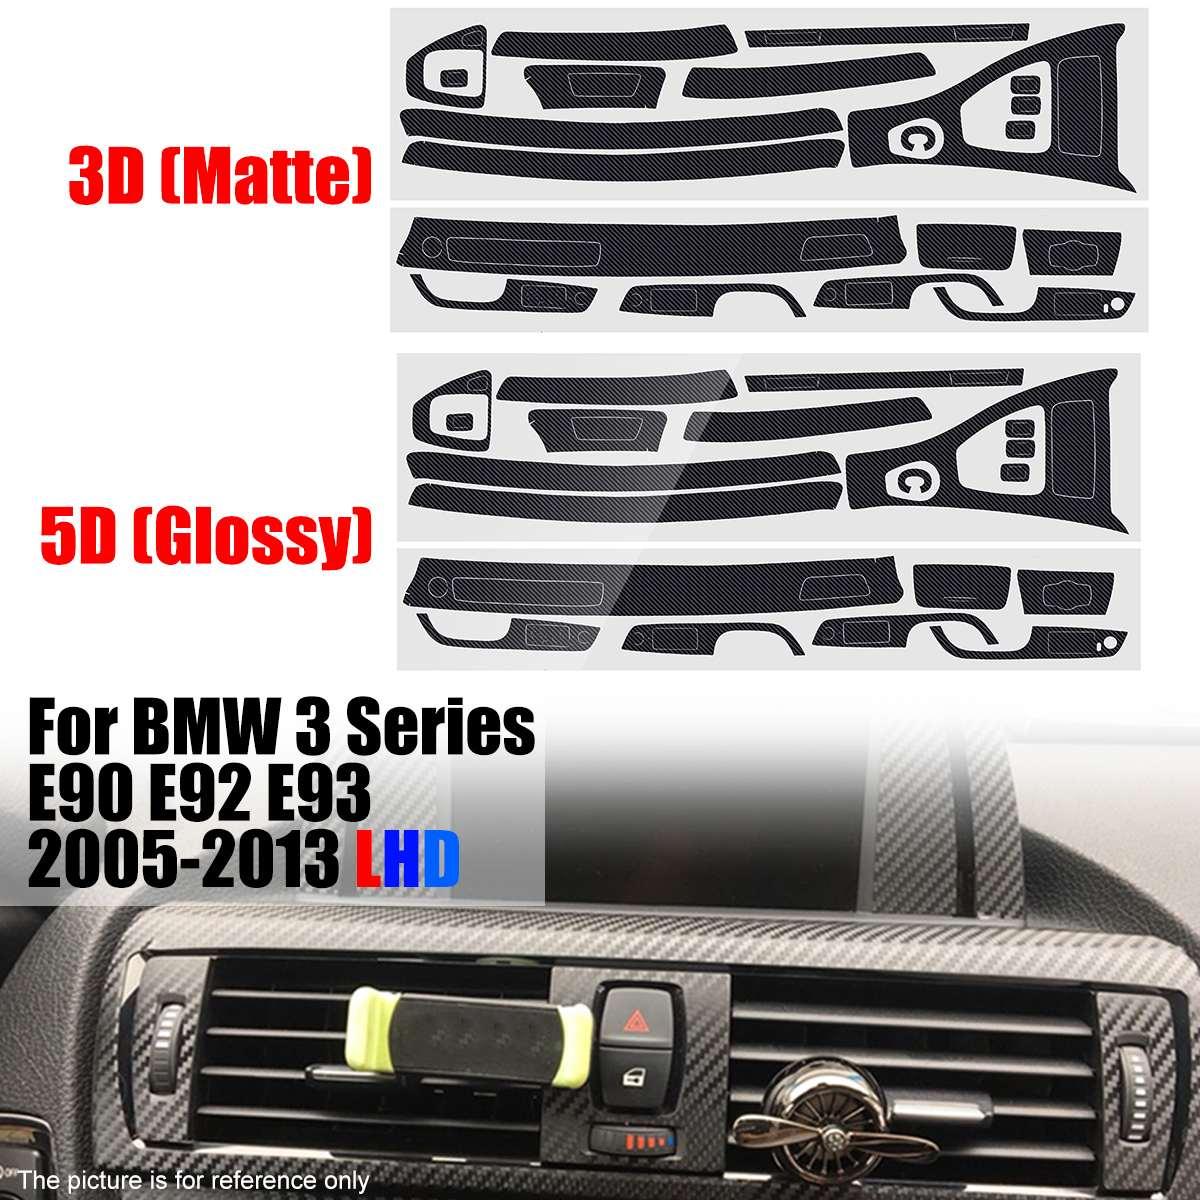 RHD LHD Glossy Carbon Fiber Interior Sticker Vinyl Center Console Trim For BMW 3 Series E90 E92 E93 2005-2013 C-type Base